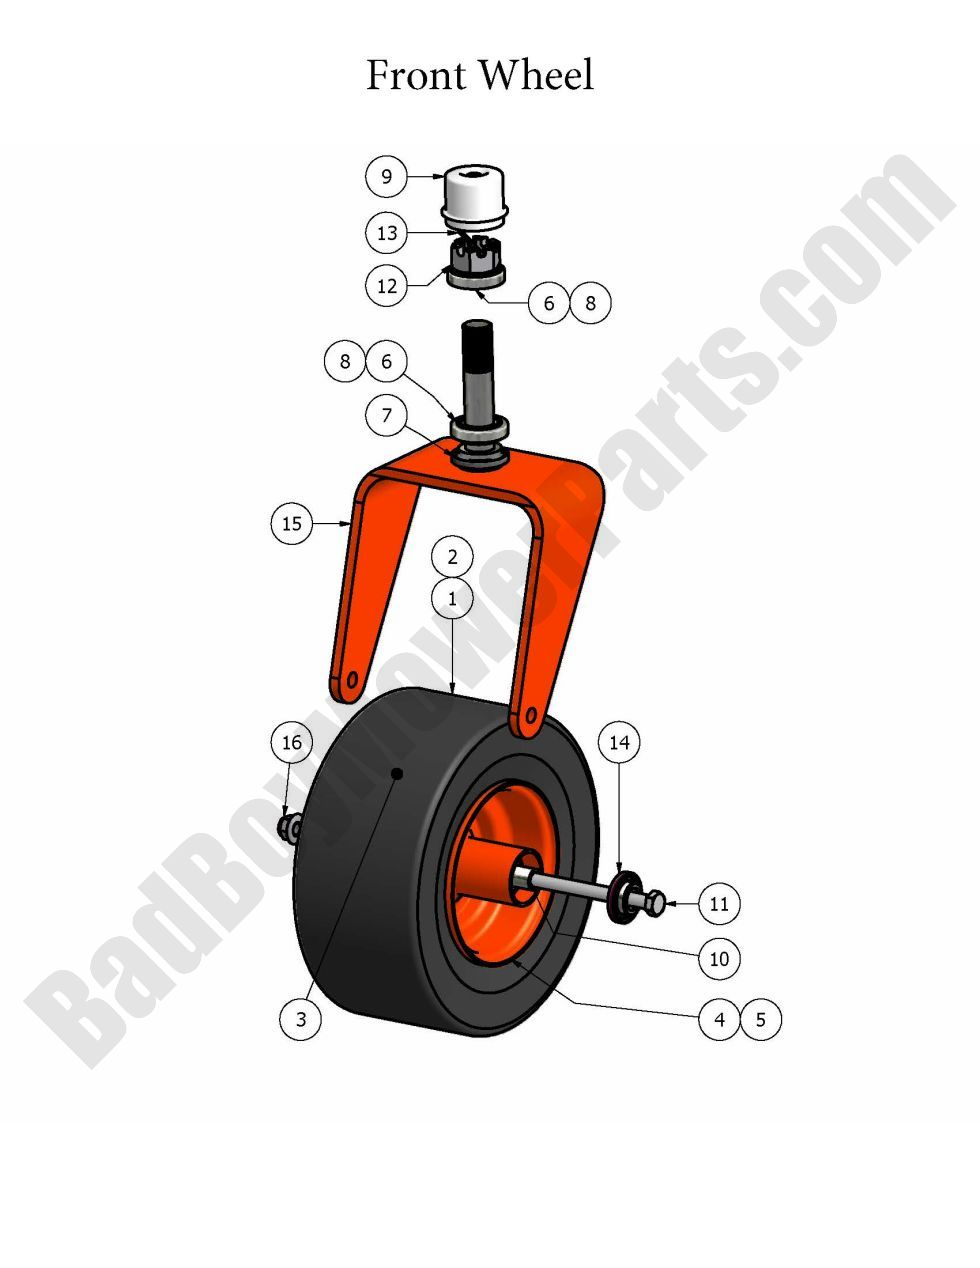 Bad Boy Parts Lookup 2008 Zt Front Wheel